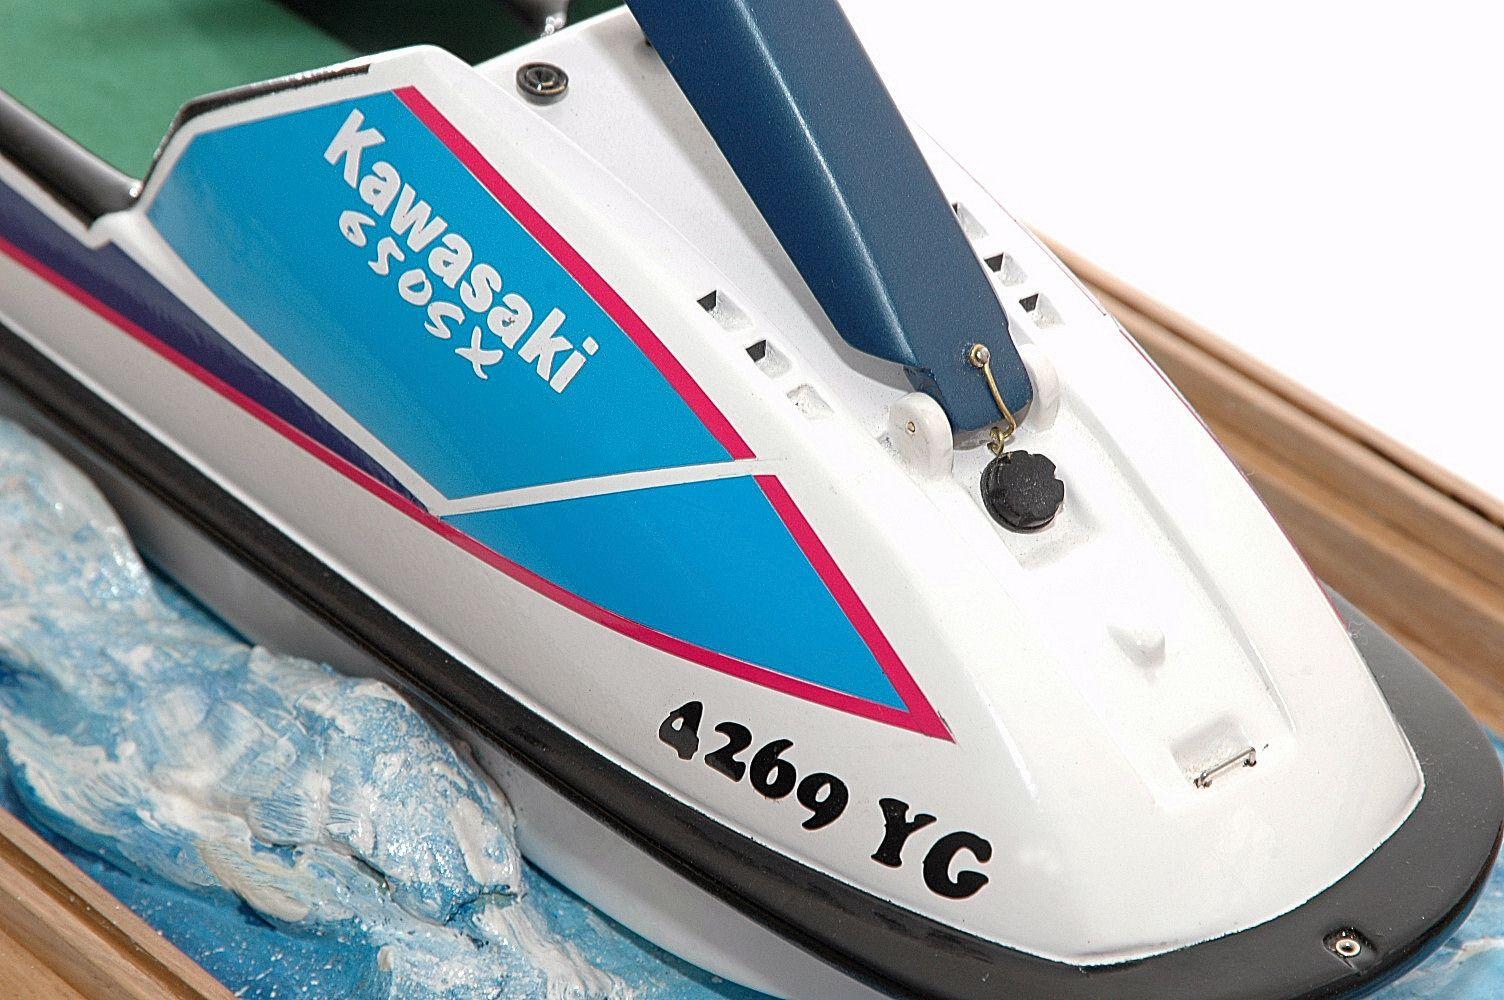 606-6196-Kawasaki-Jet-Ski